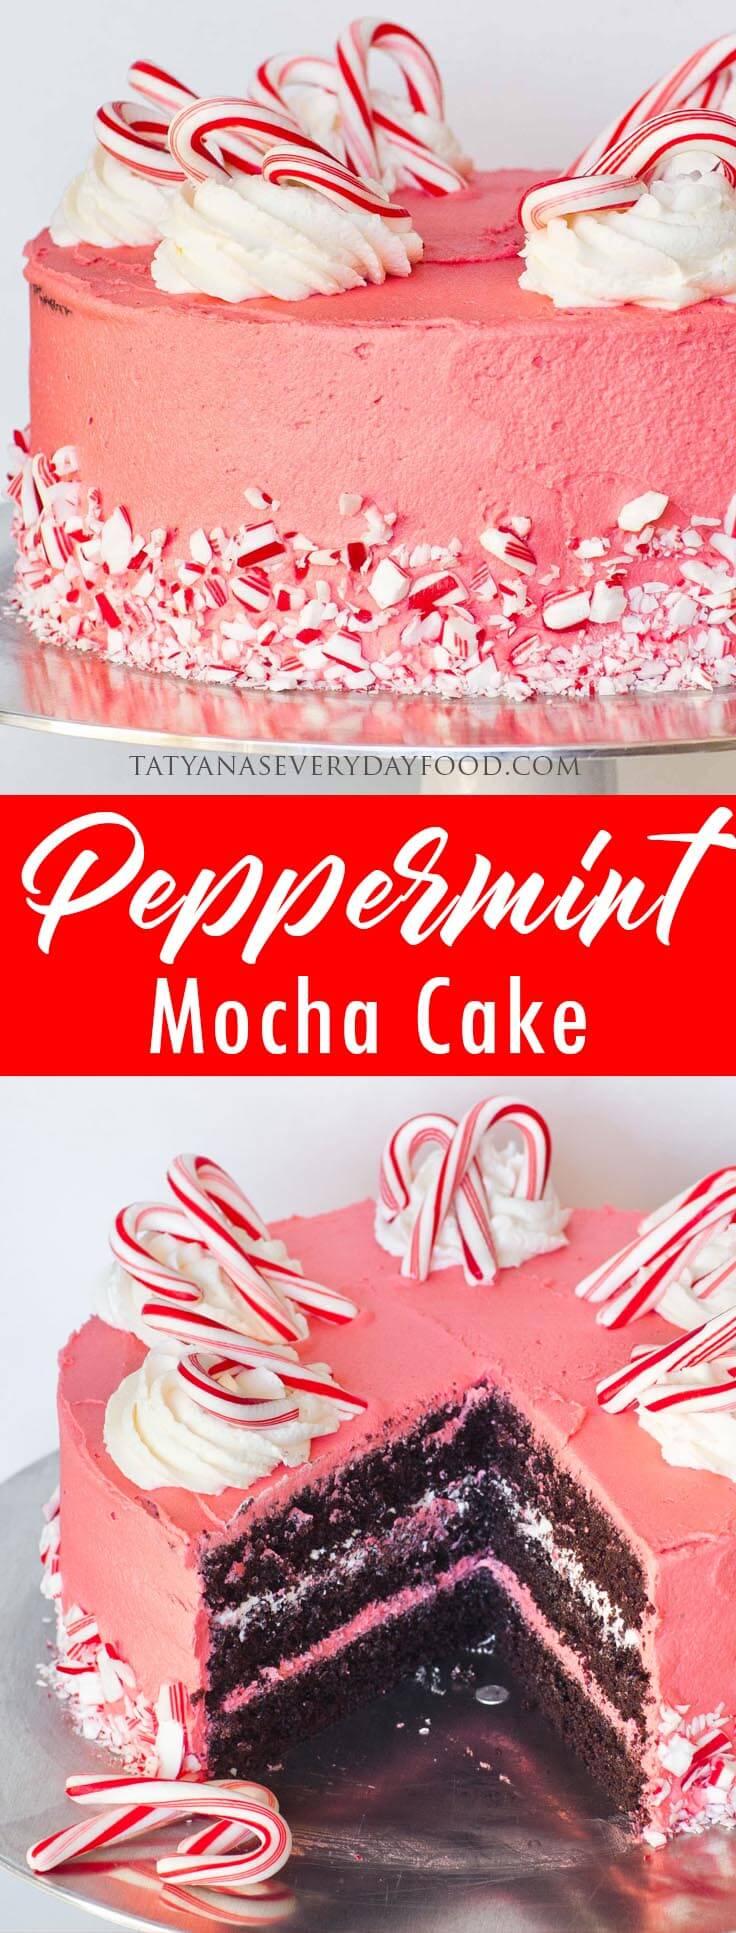 Peppermint Mocha Cake video recipe